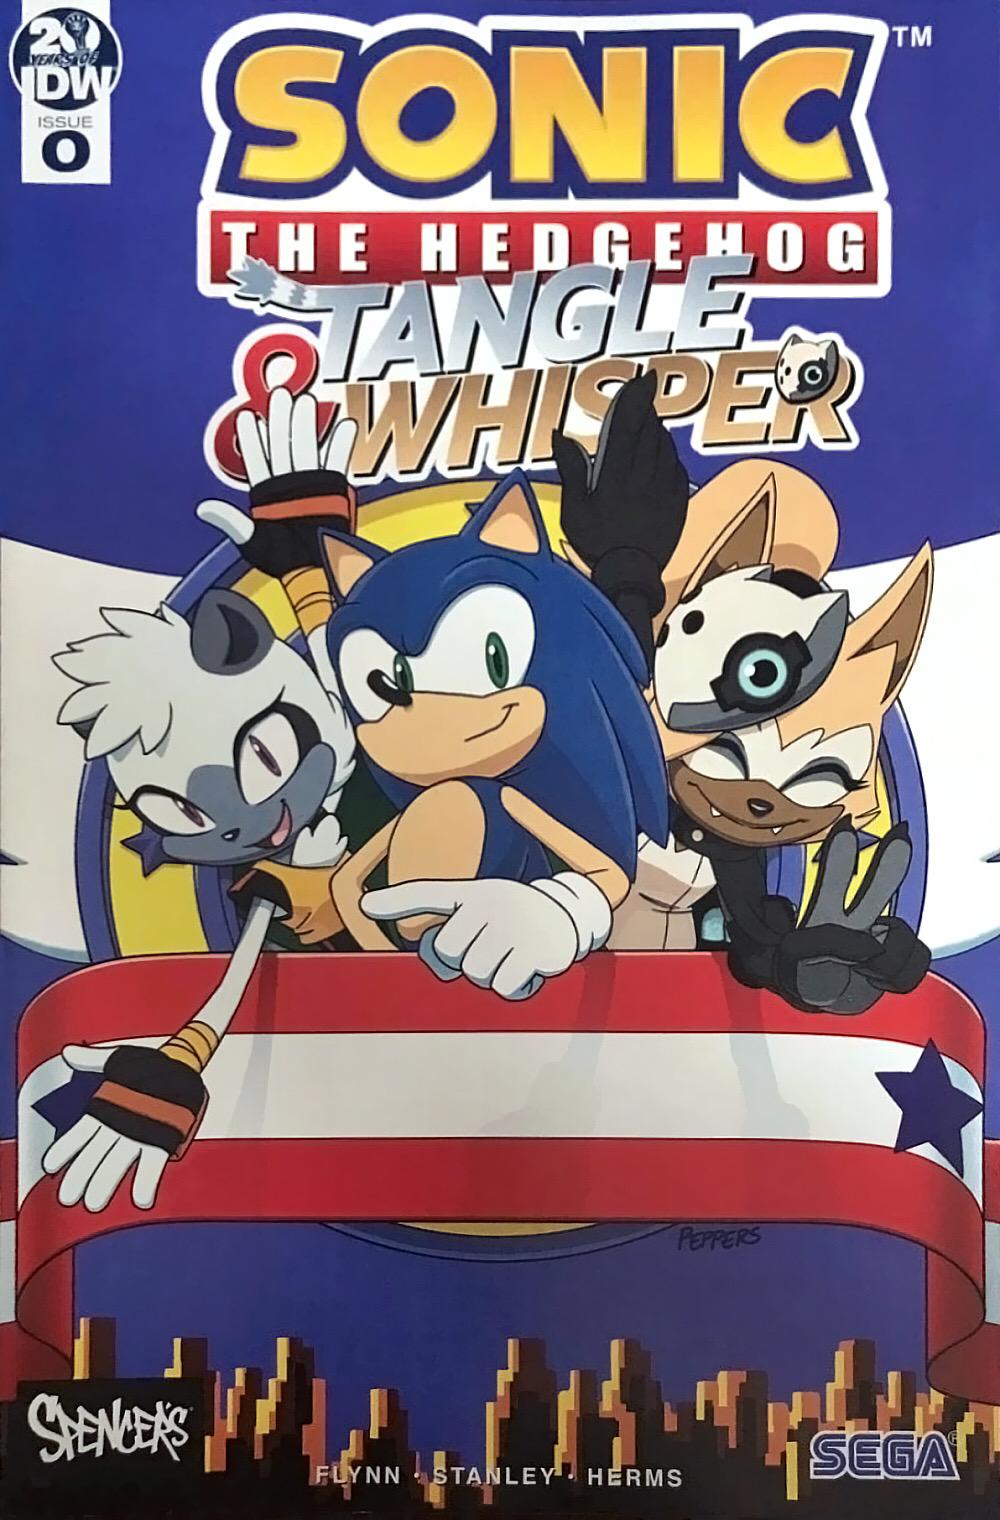 Sonic The Hedgehog Tangle Whisper Issue 0 Sonic News Network Fandom